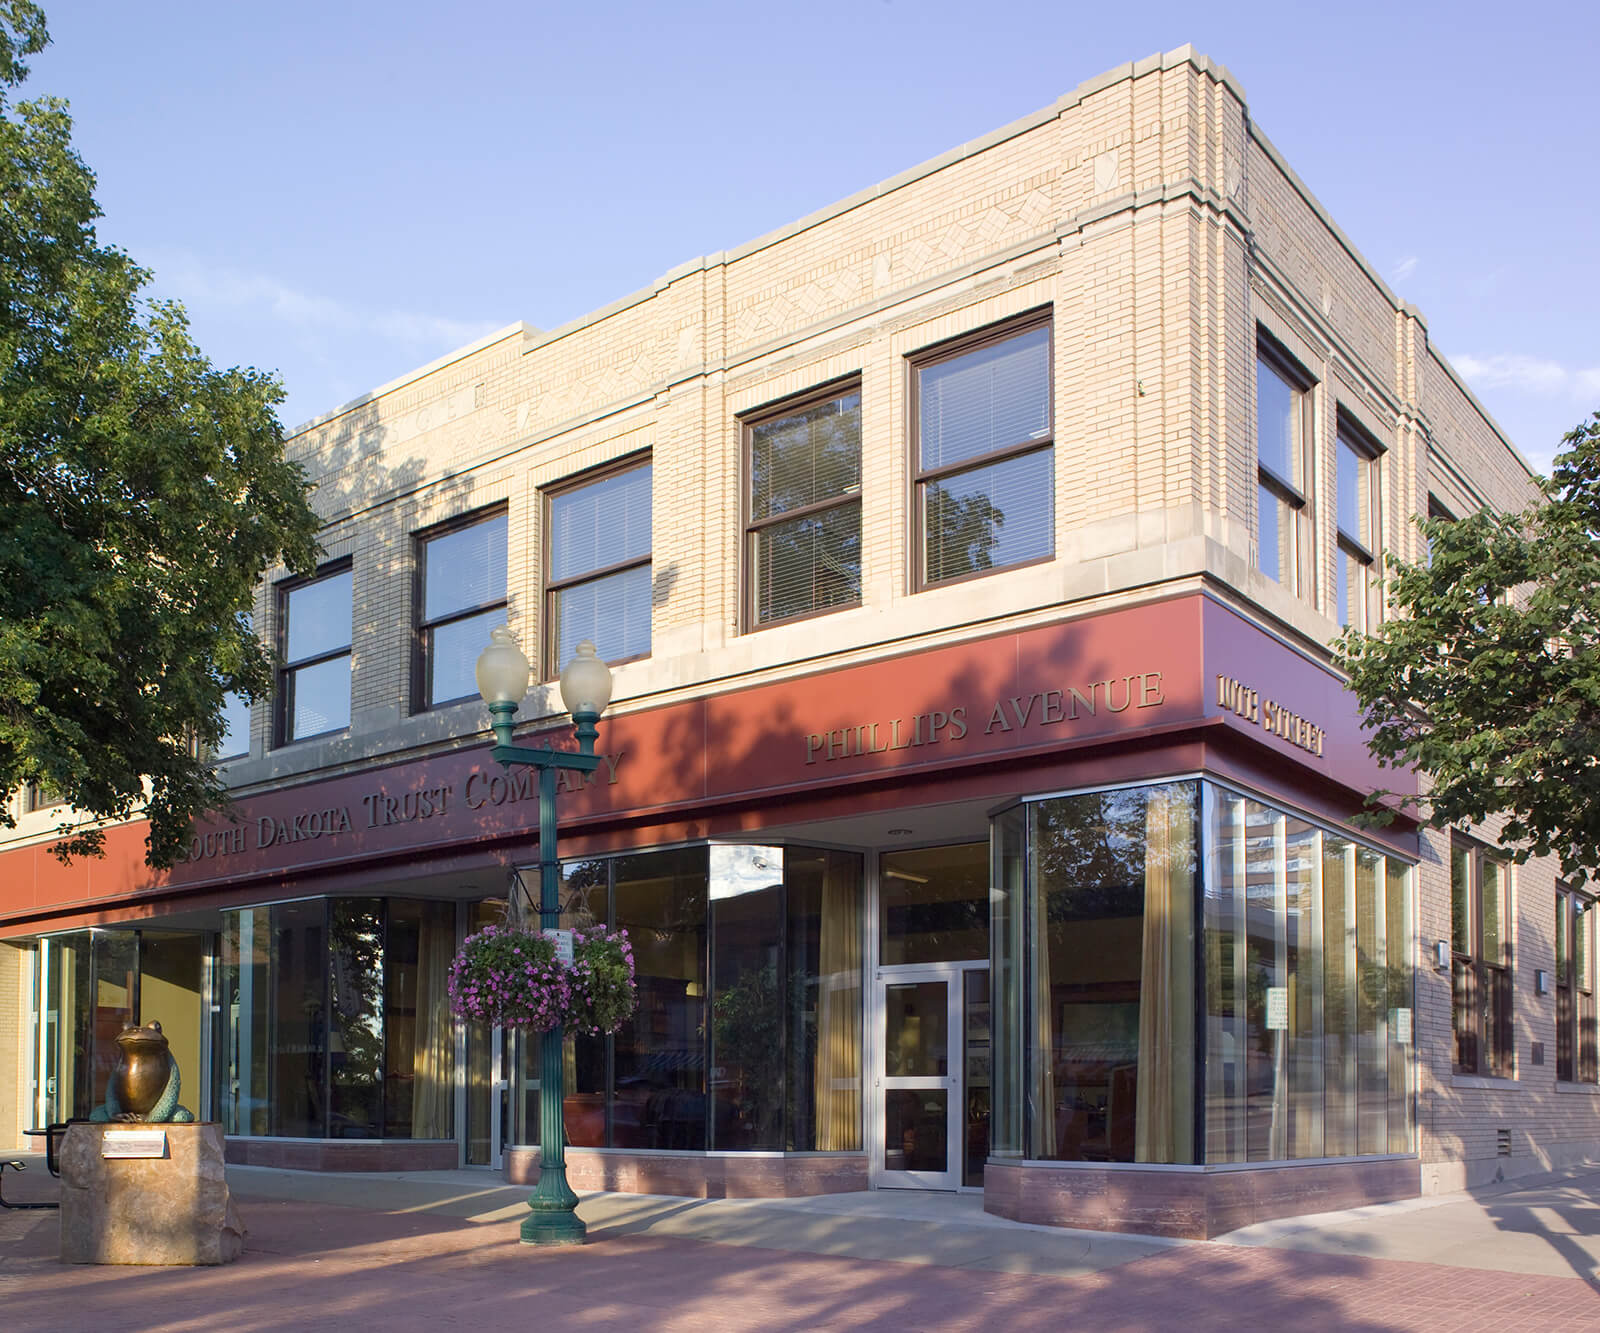 South Dakota Trust Co.